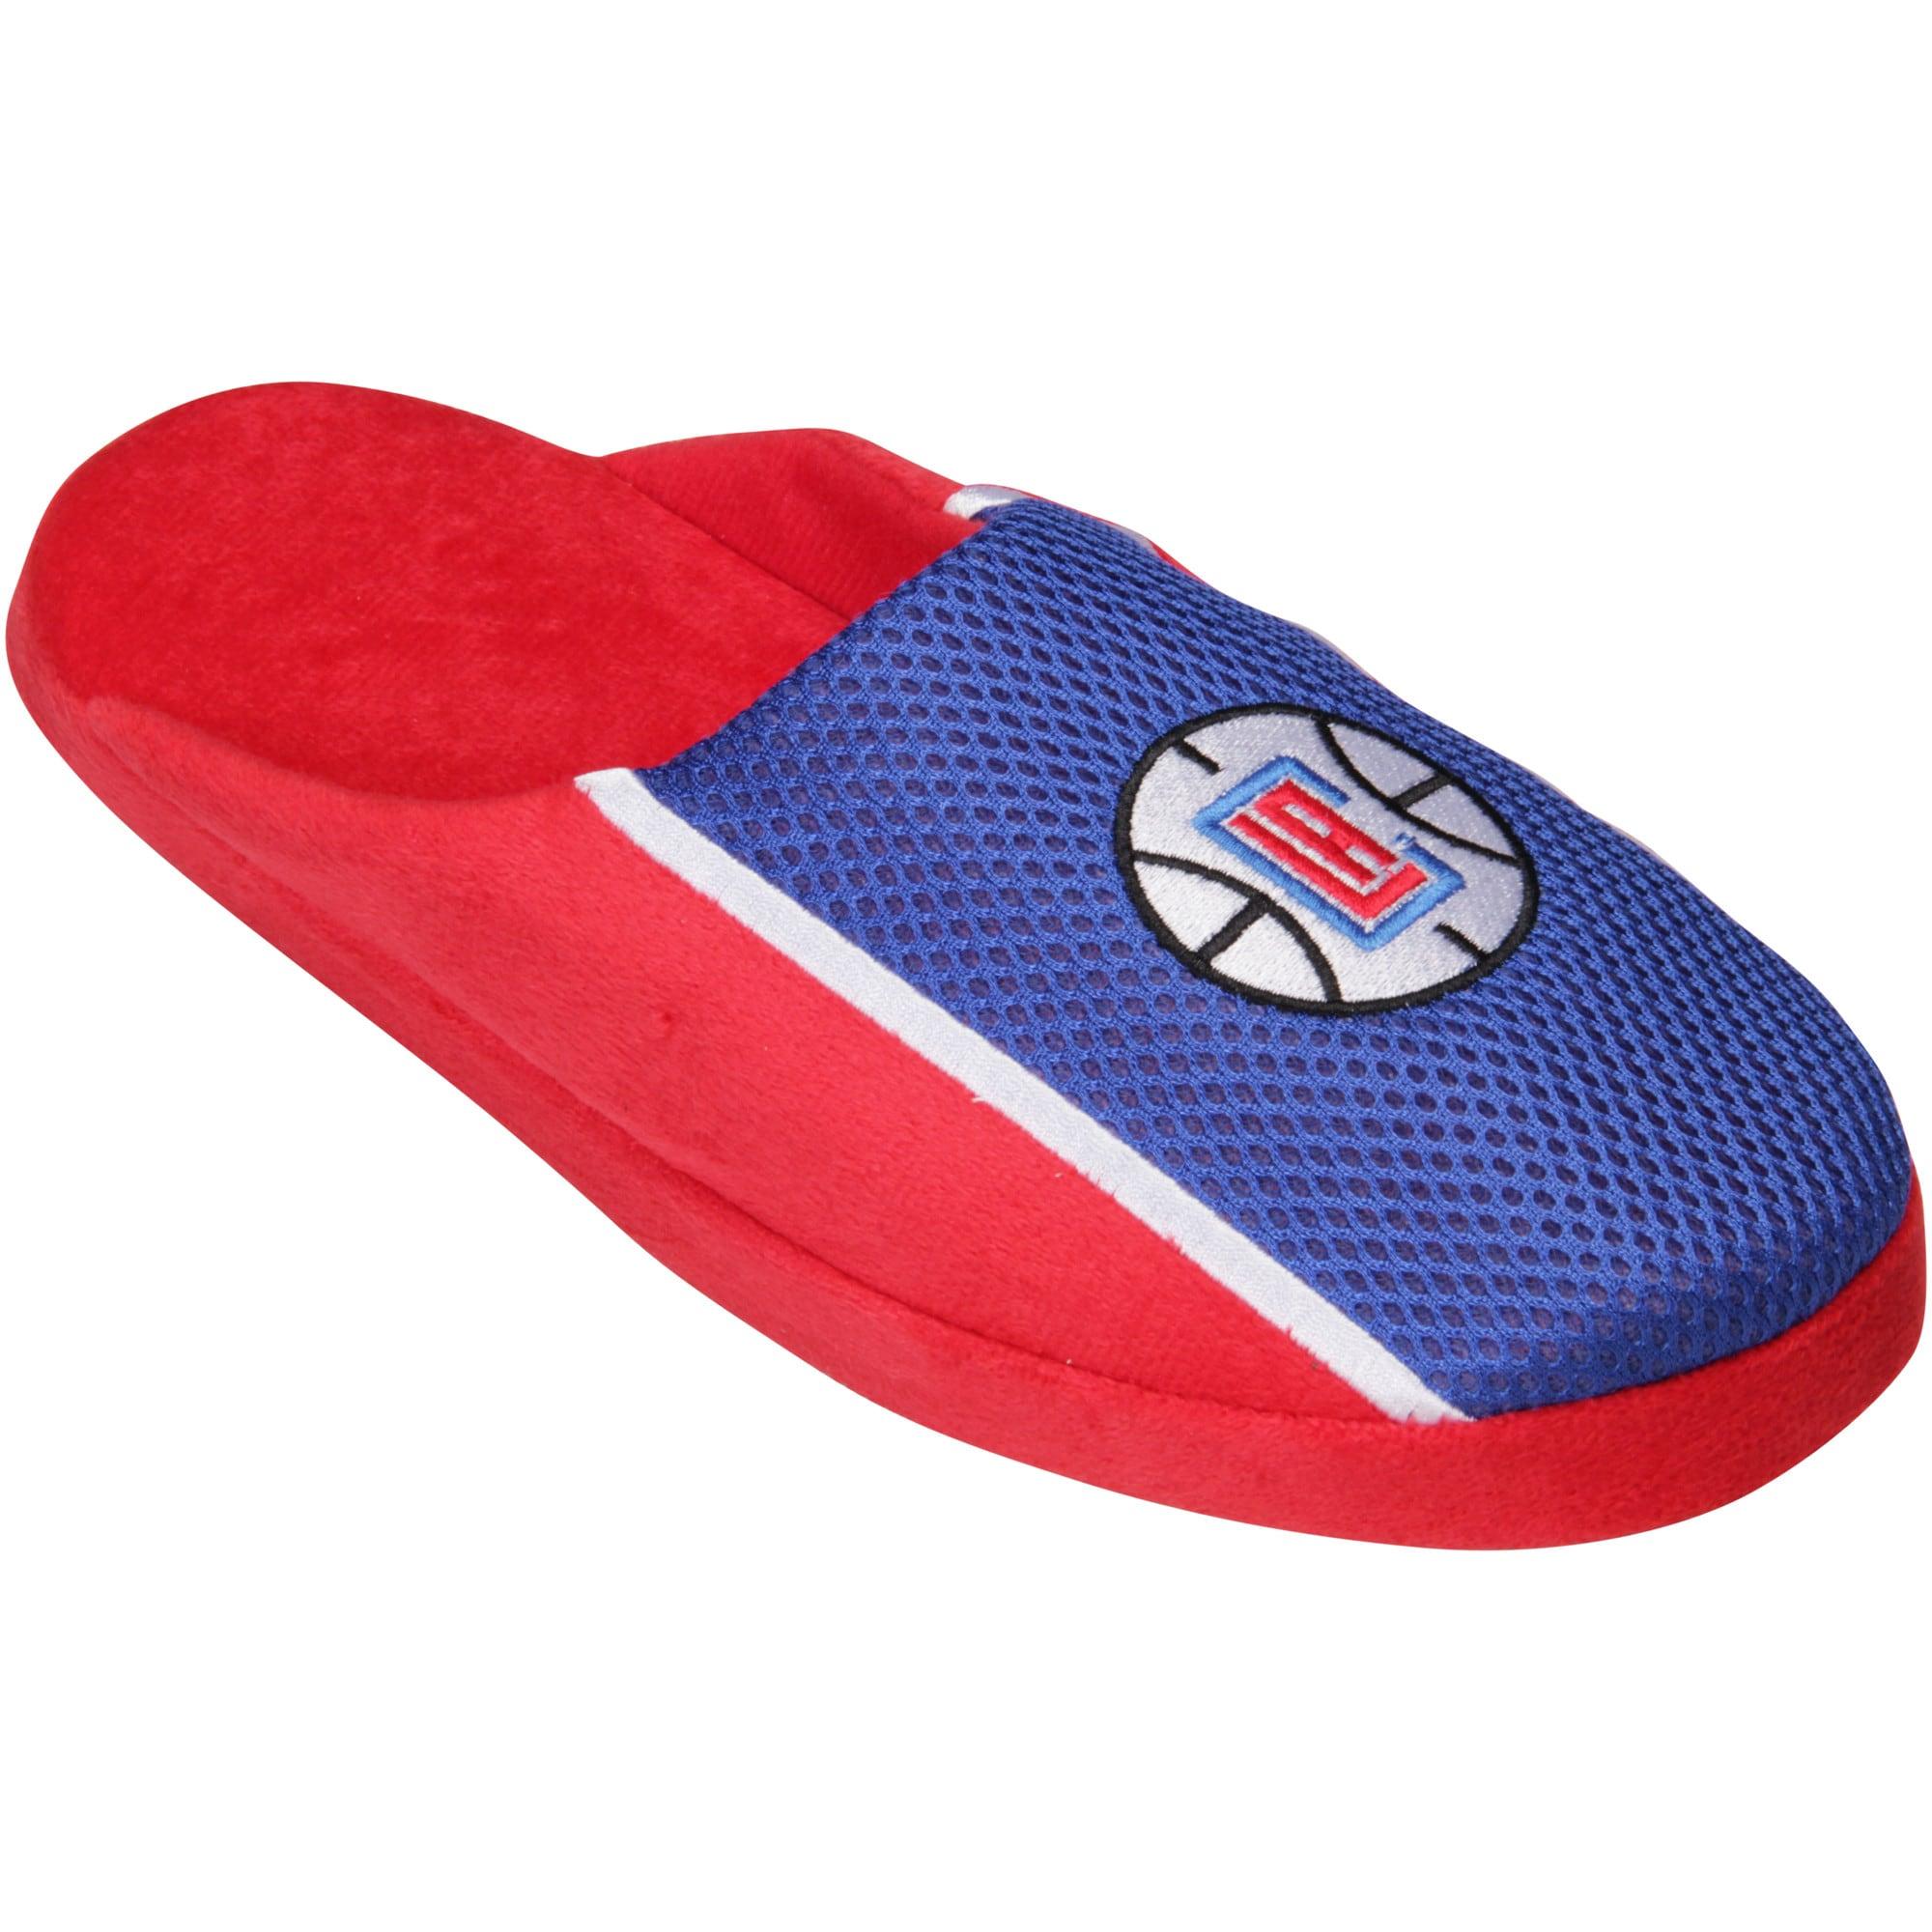 LA Clippers Jersey Slide Slippers